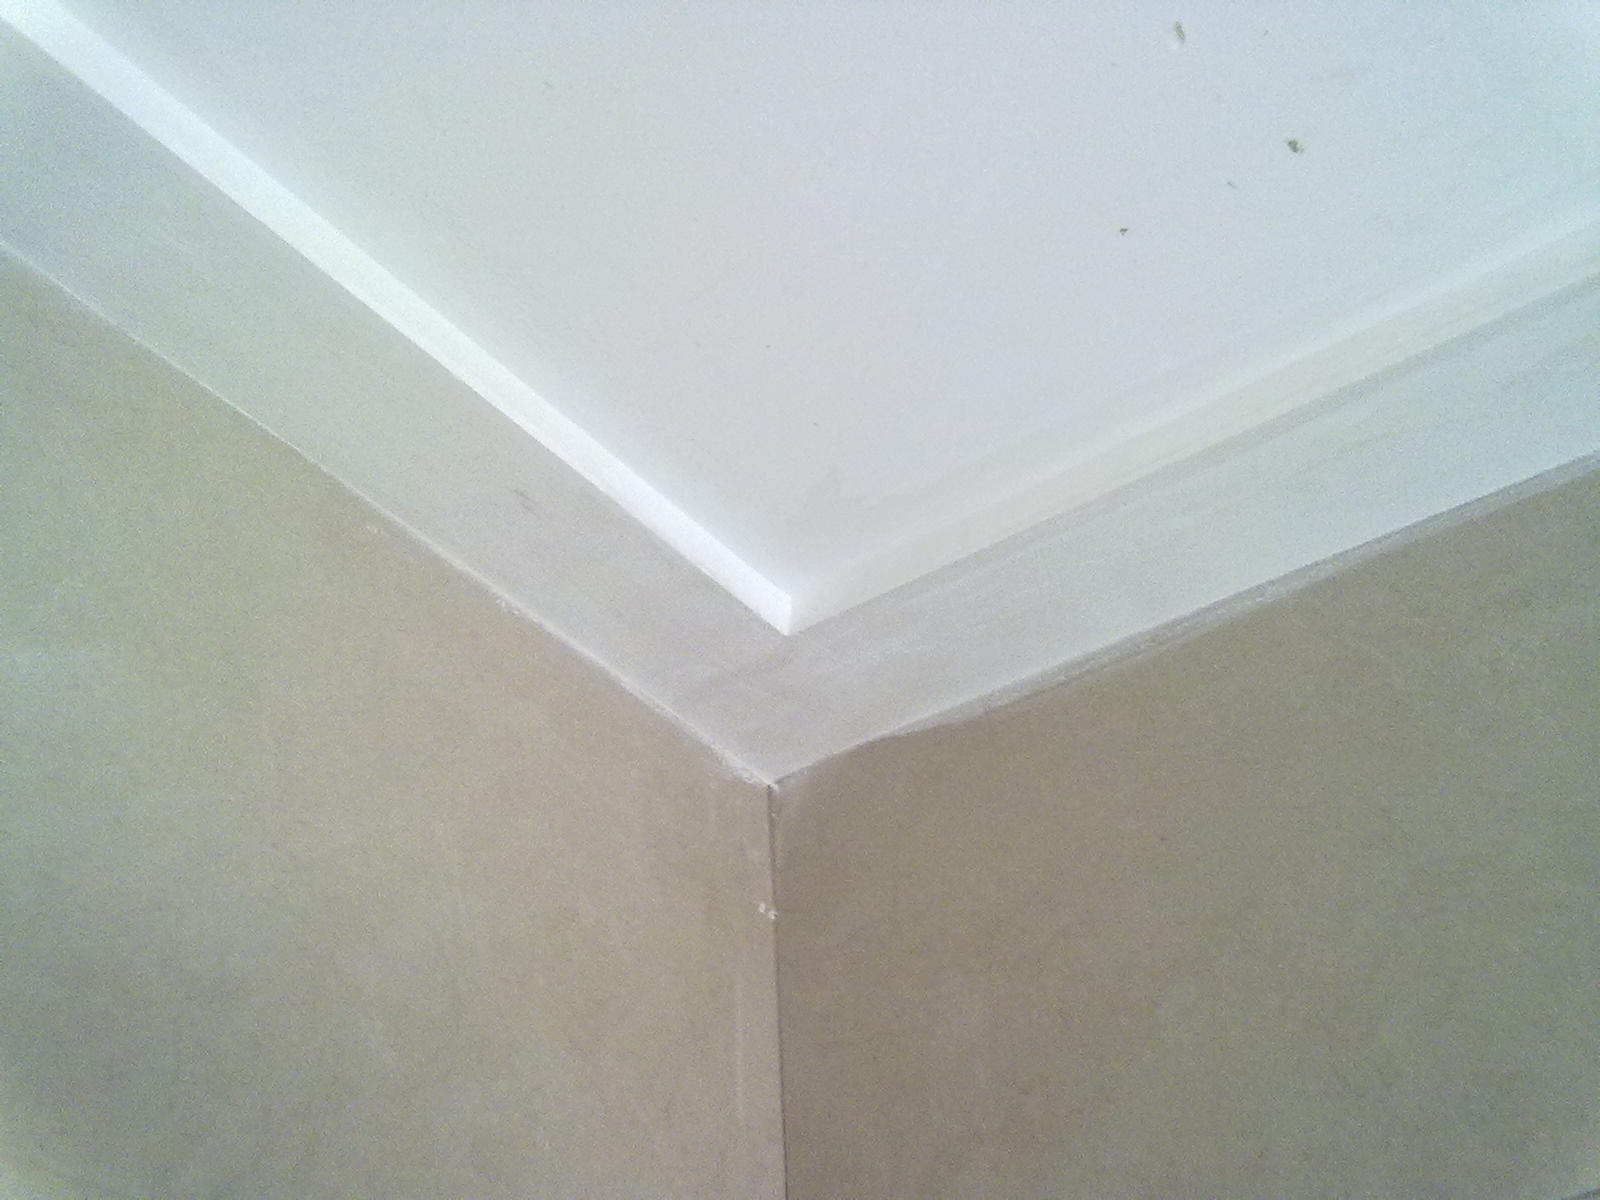 Molduras para techo car interior design - Molduras de techo ...